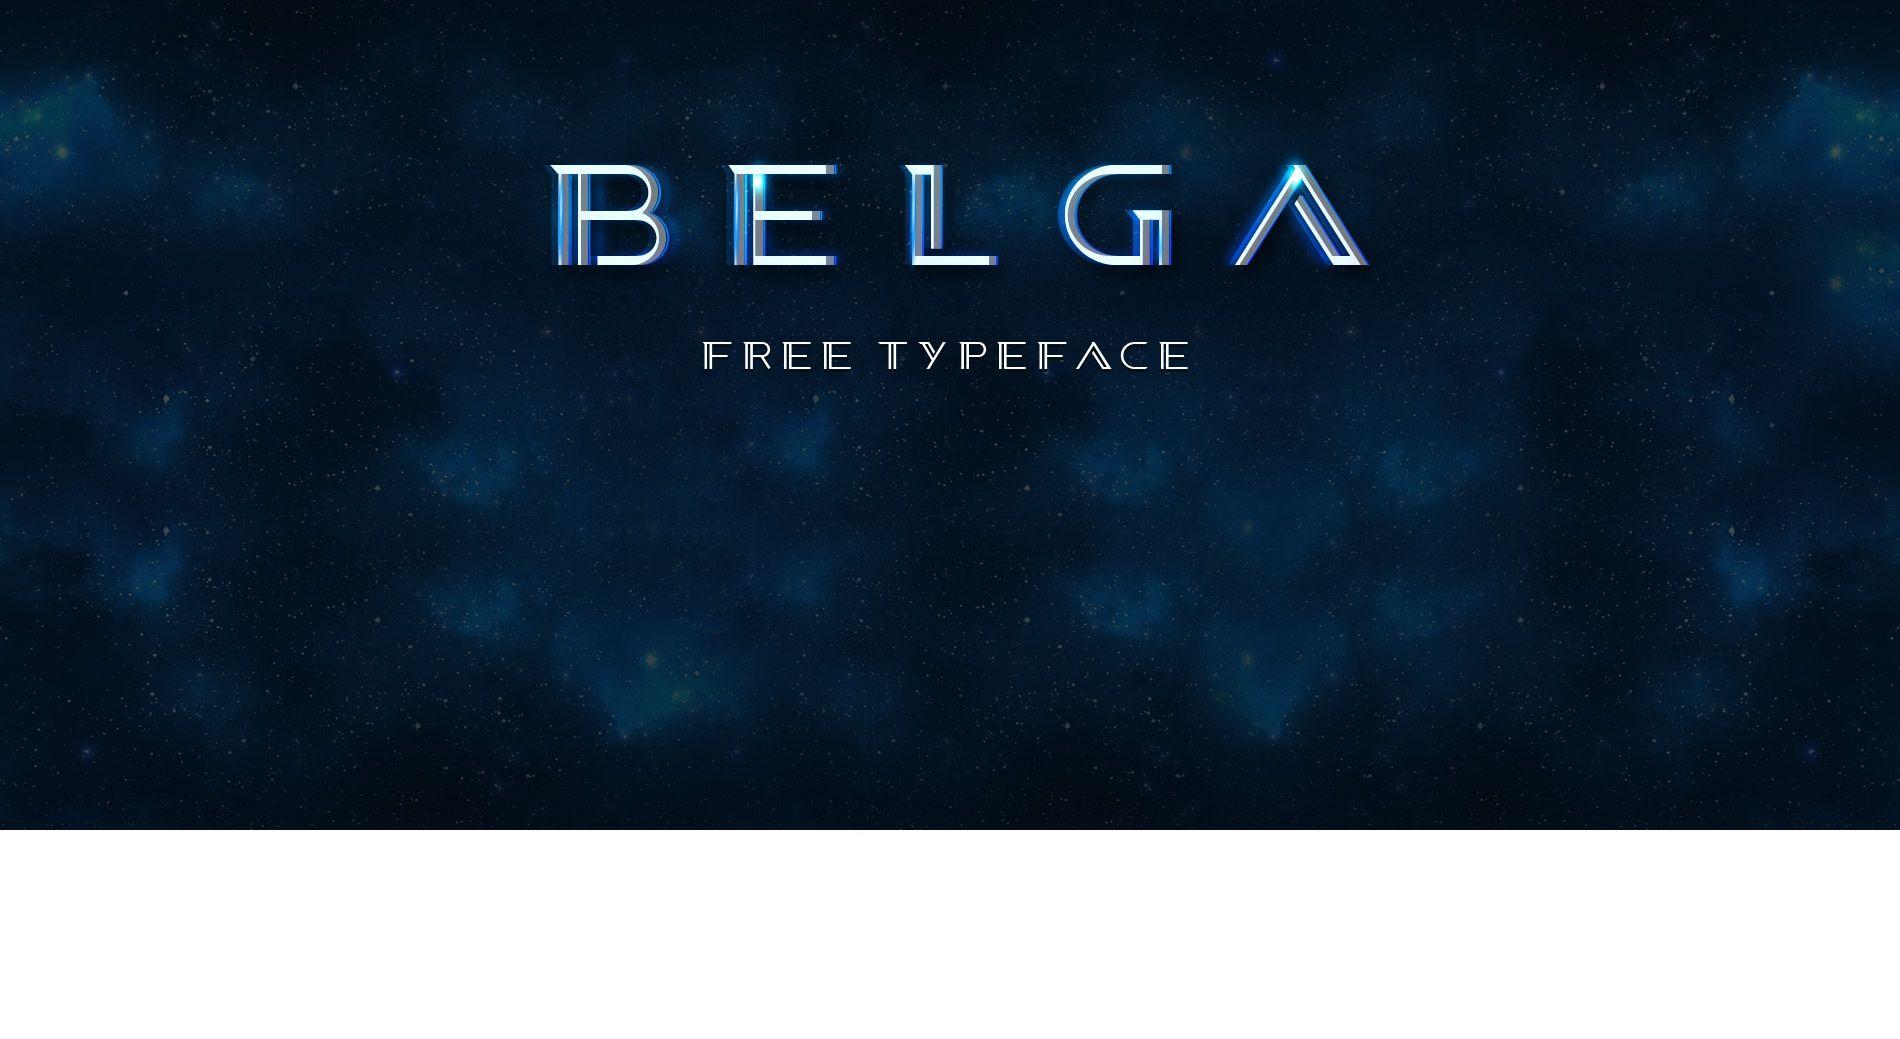 http://rahulchandh.com/belga-font/